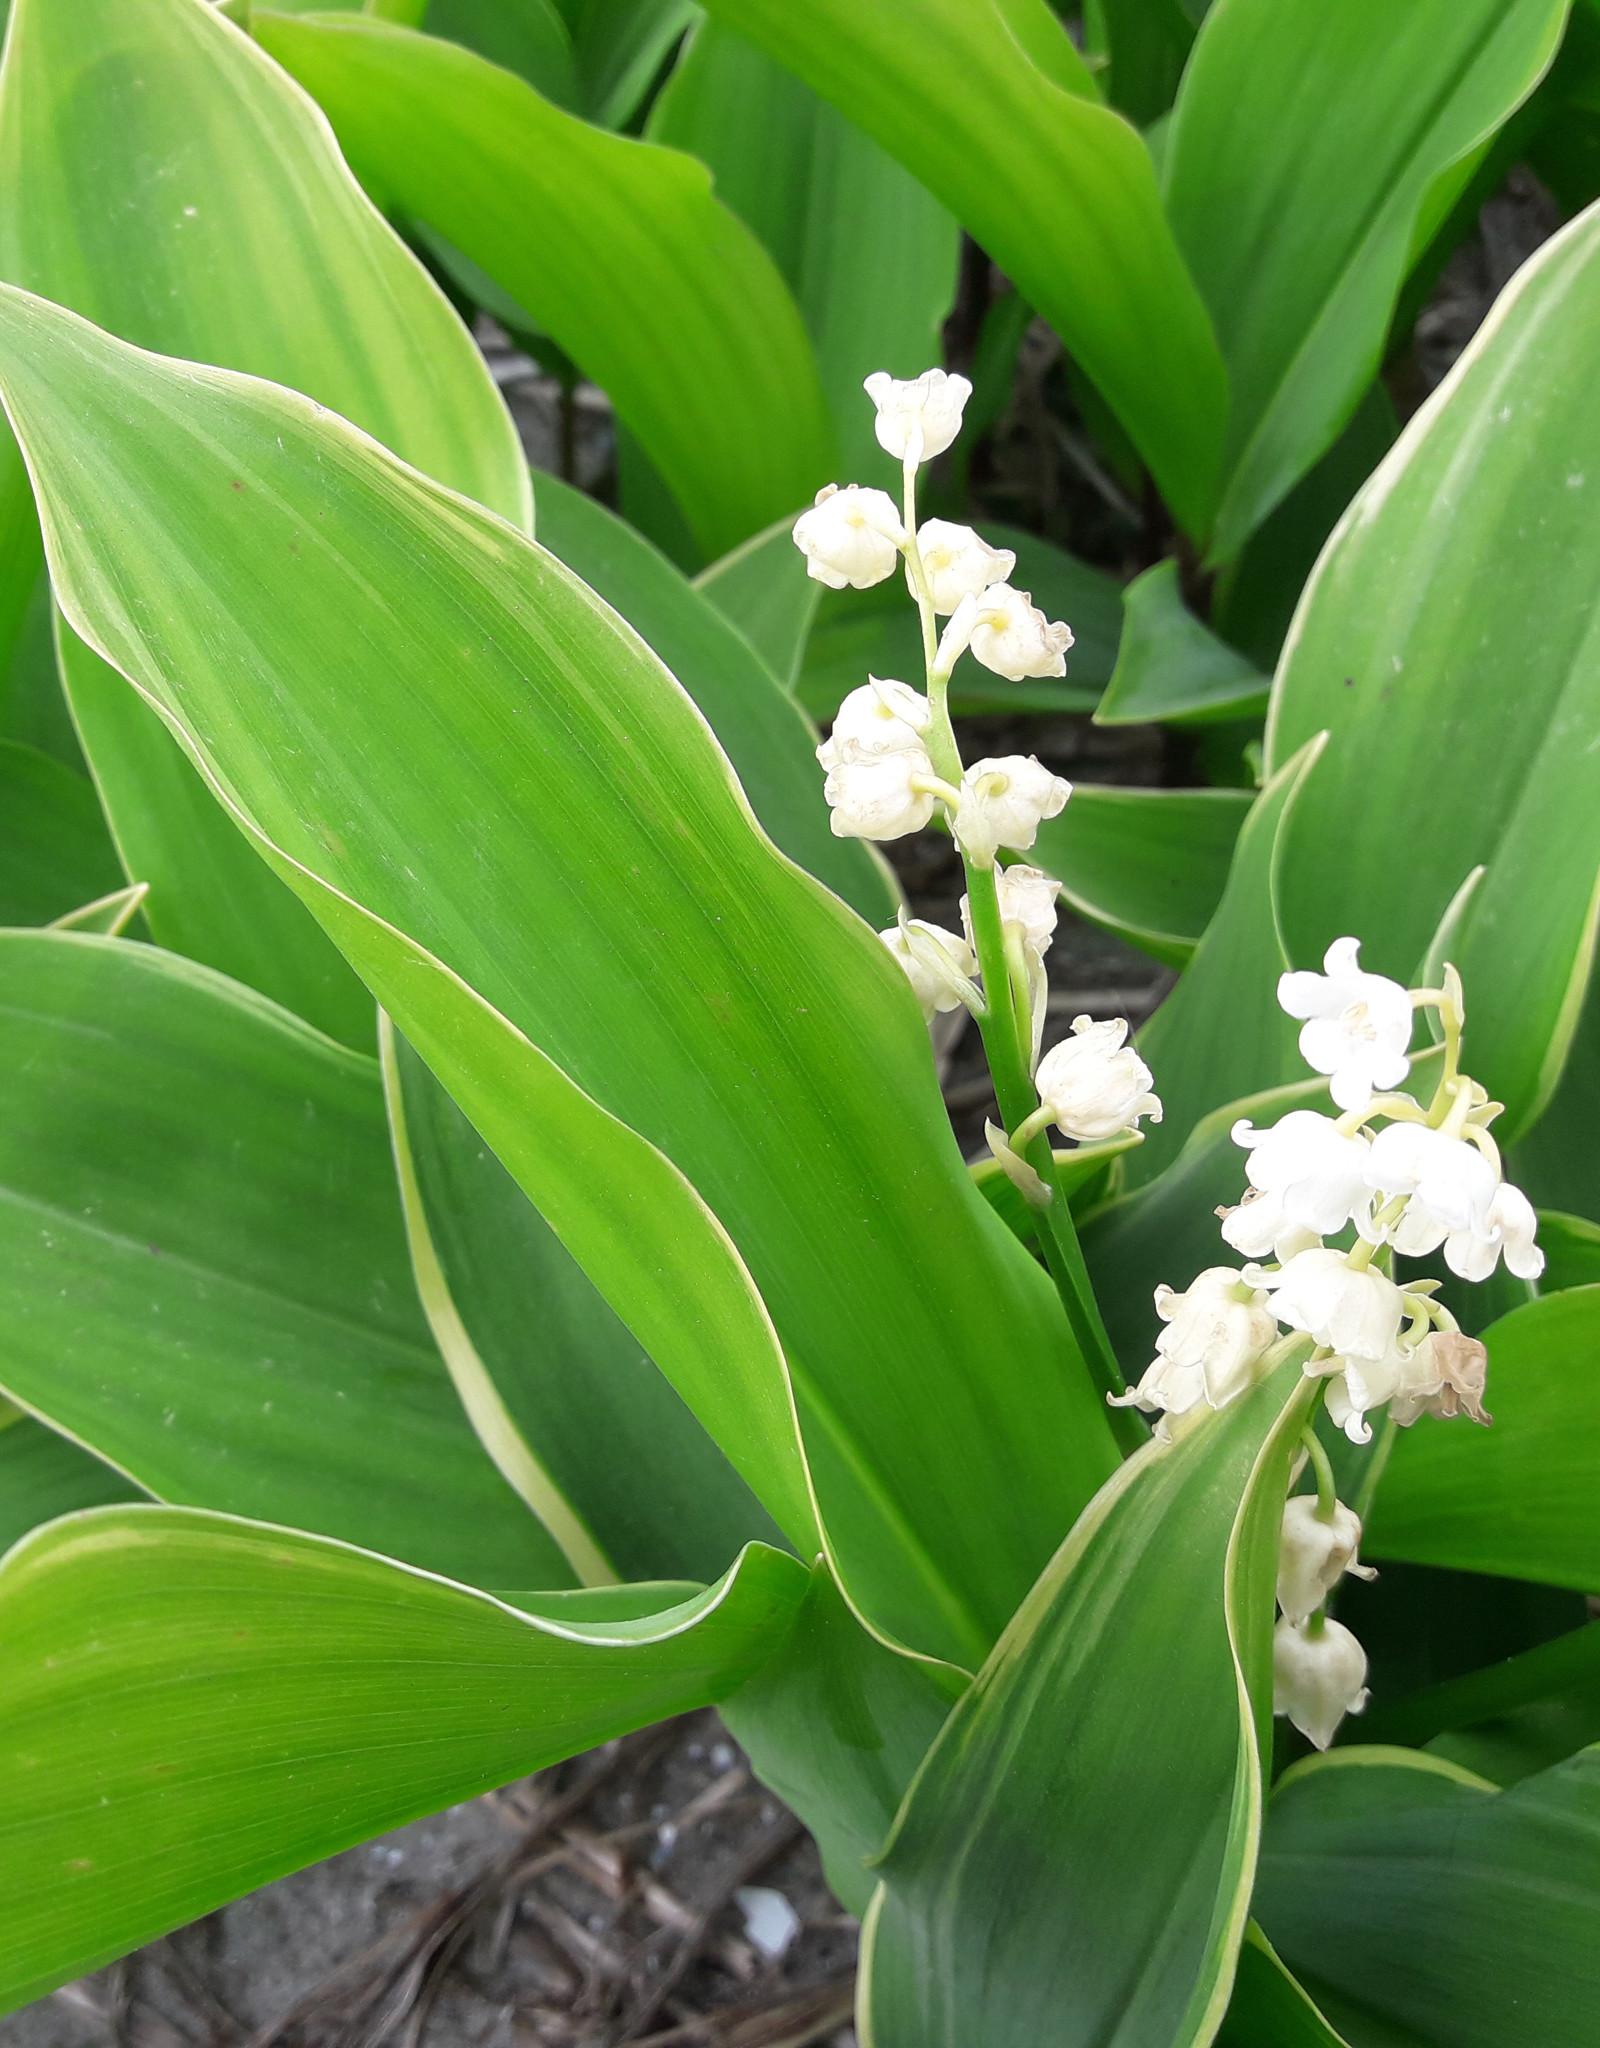 Maiglöckchen  Convallaria majalis 'Hofheim' (Maiglöckchen) - Stinsenpflanze